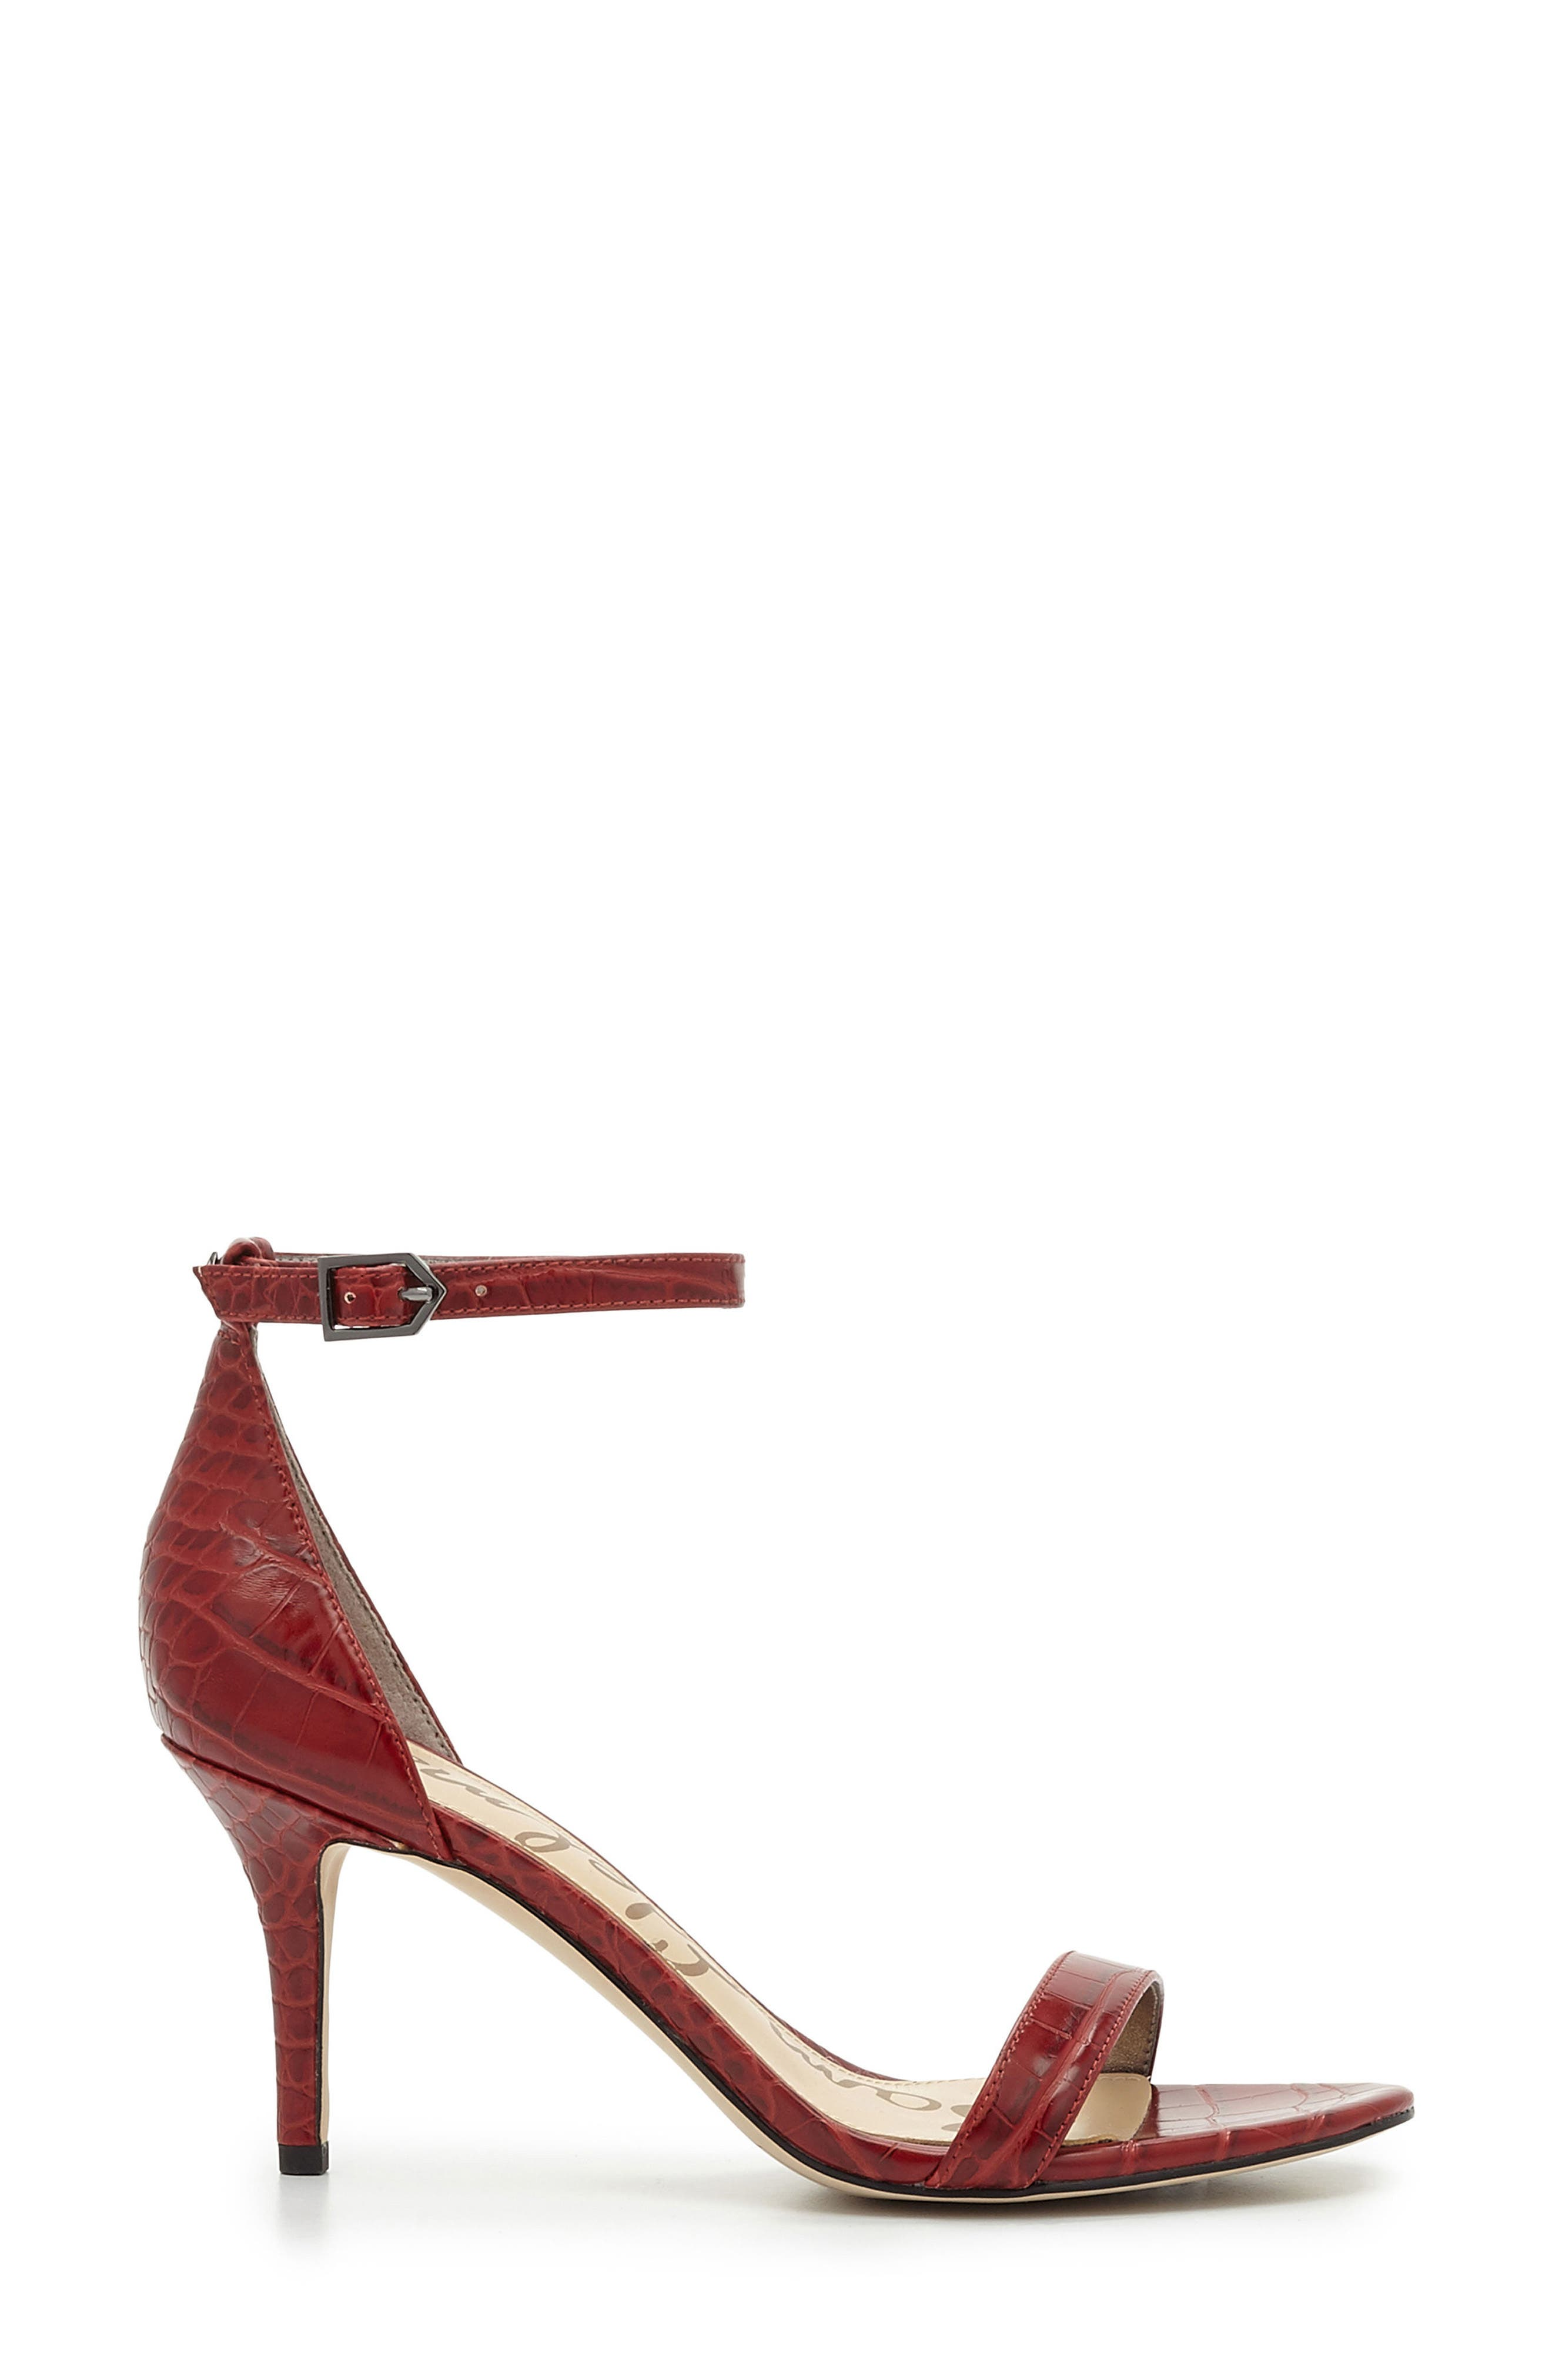 ,                             'Patti' Ankle Strap Sandal,                             Alternate thumbnail 110, color,                             602